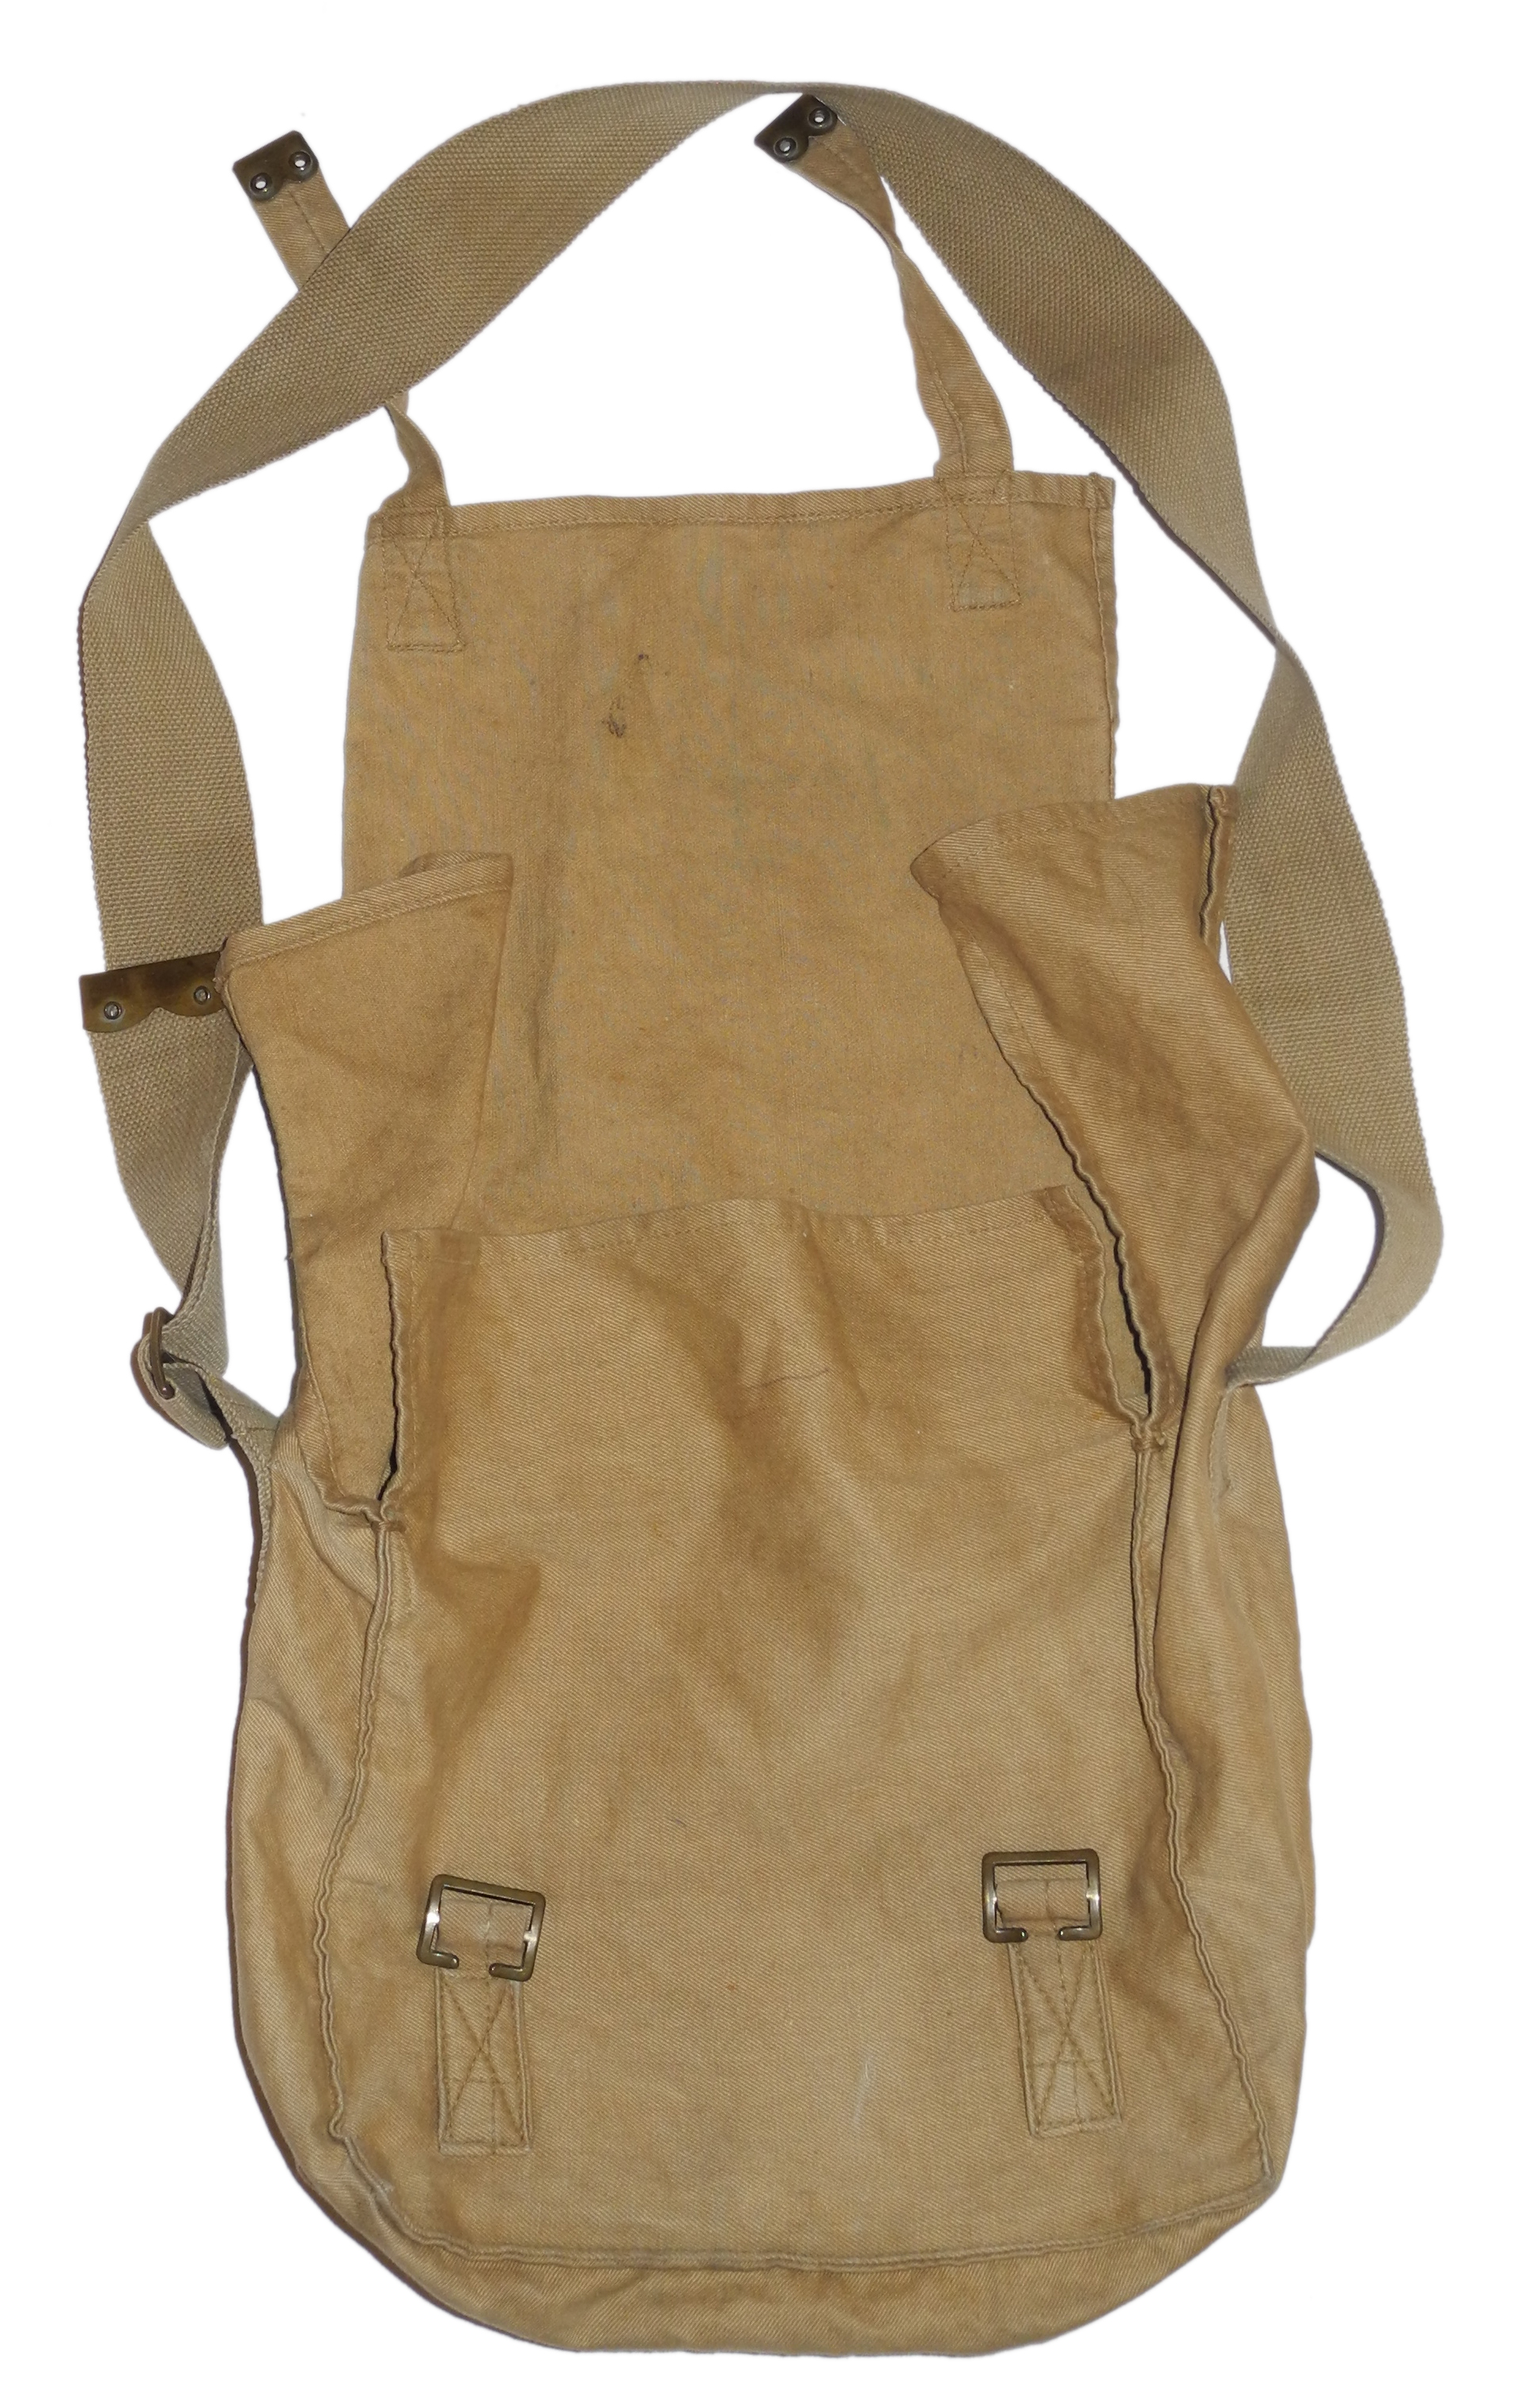 Air Raid Precautions officer's shoulder bag